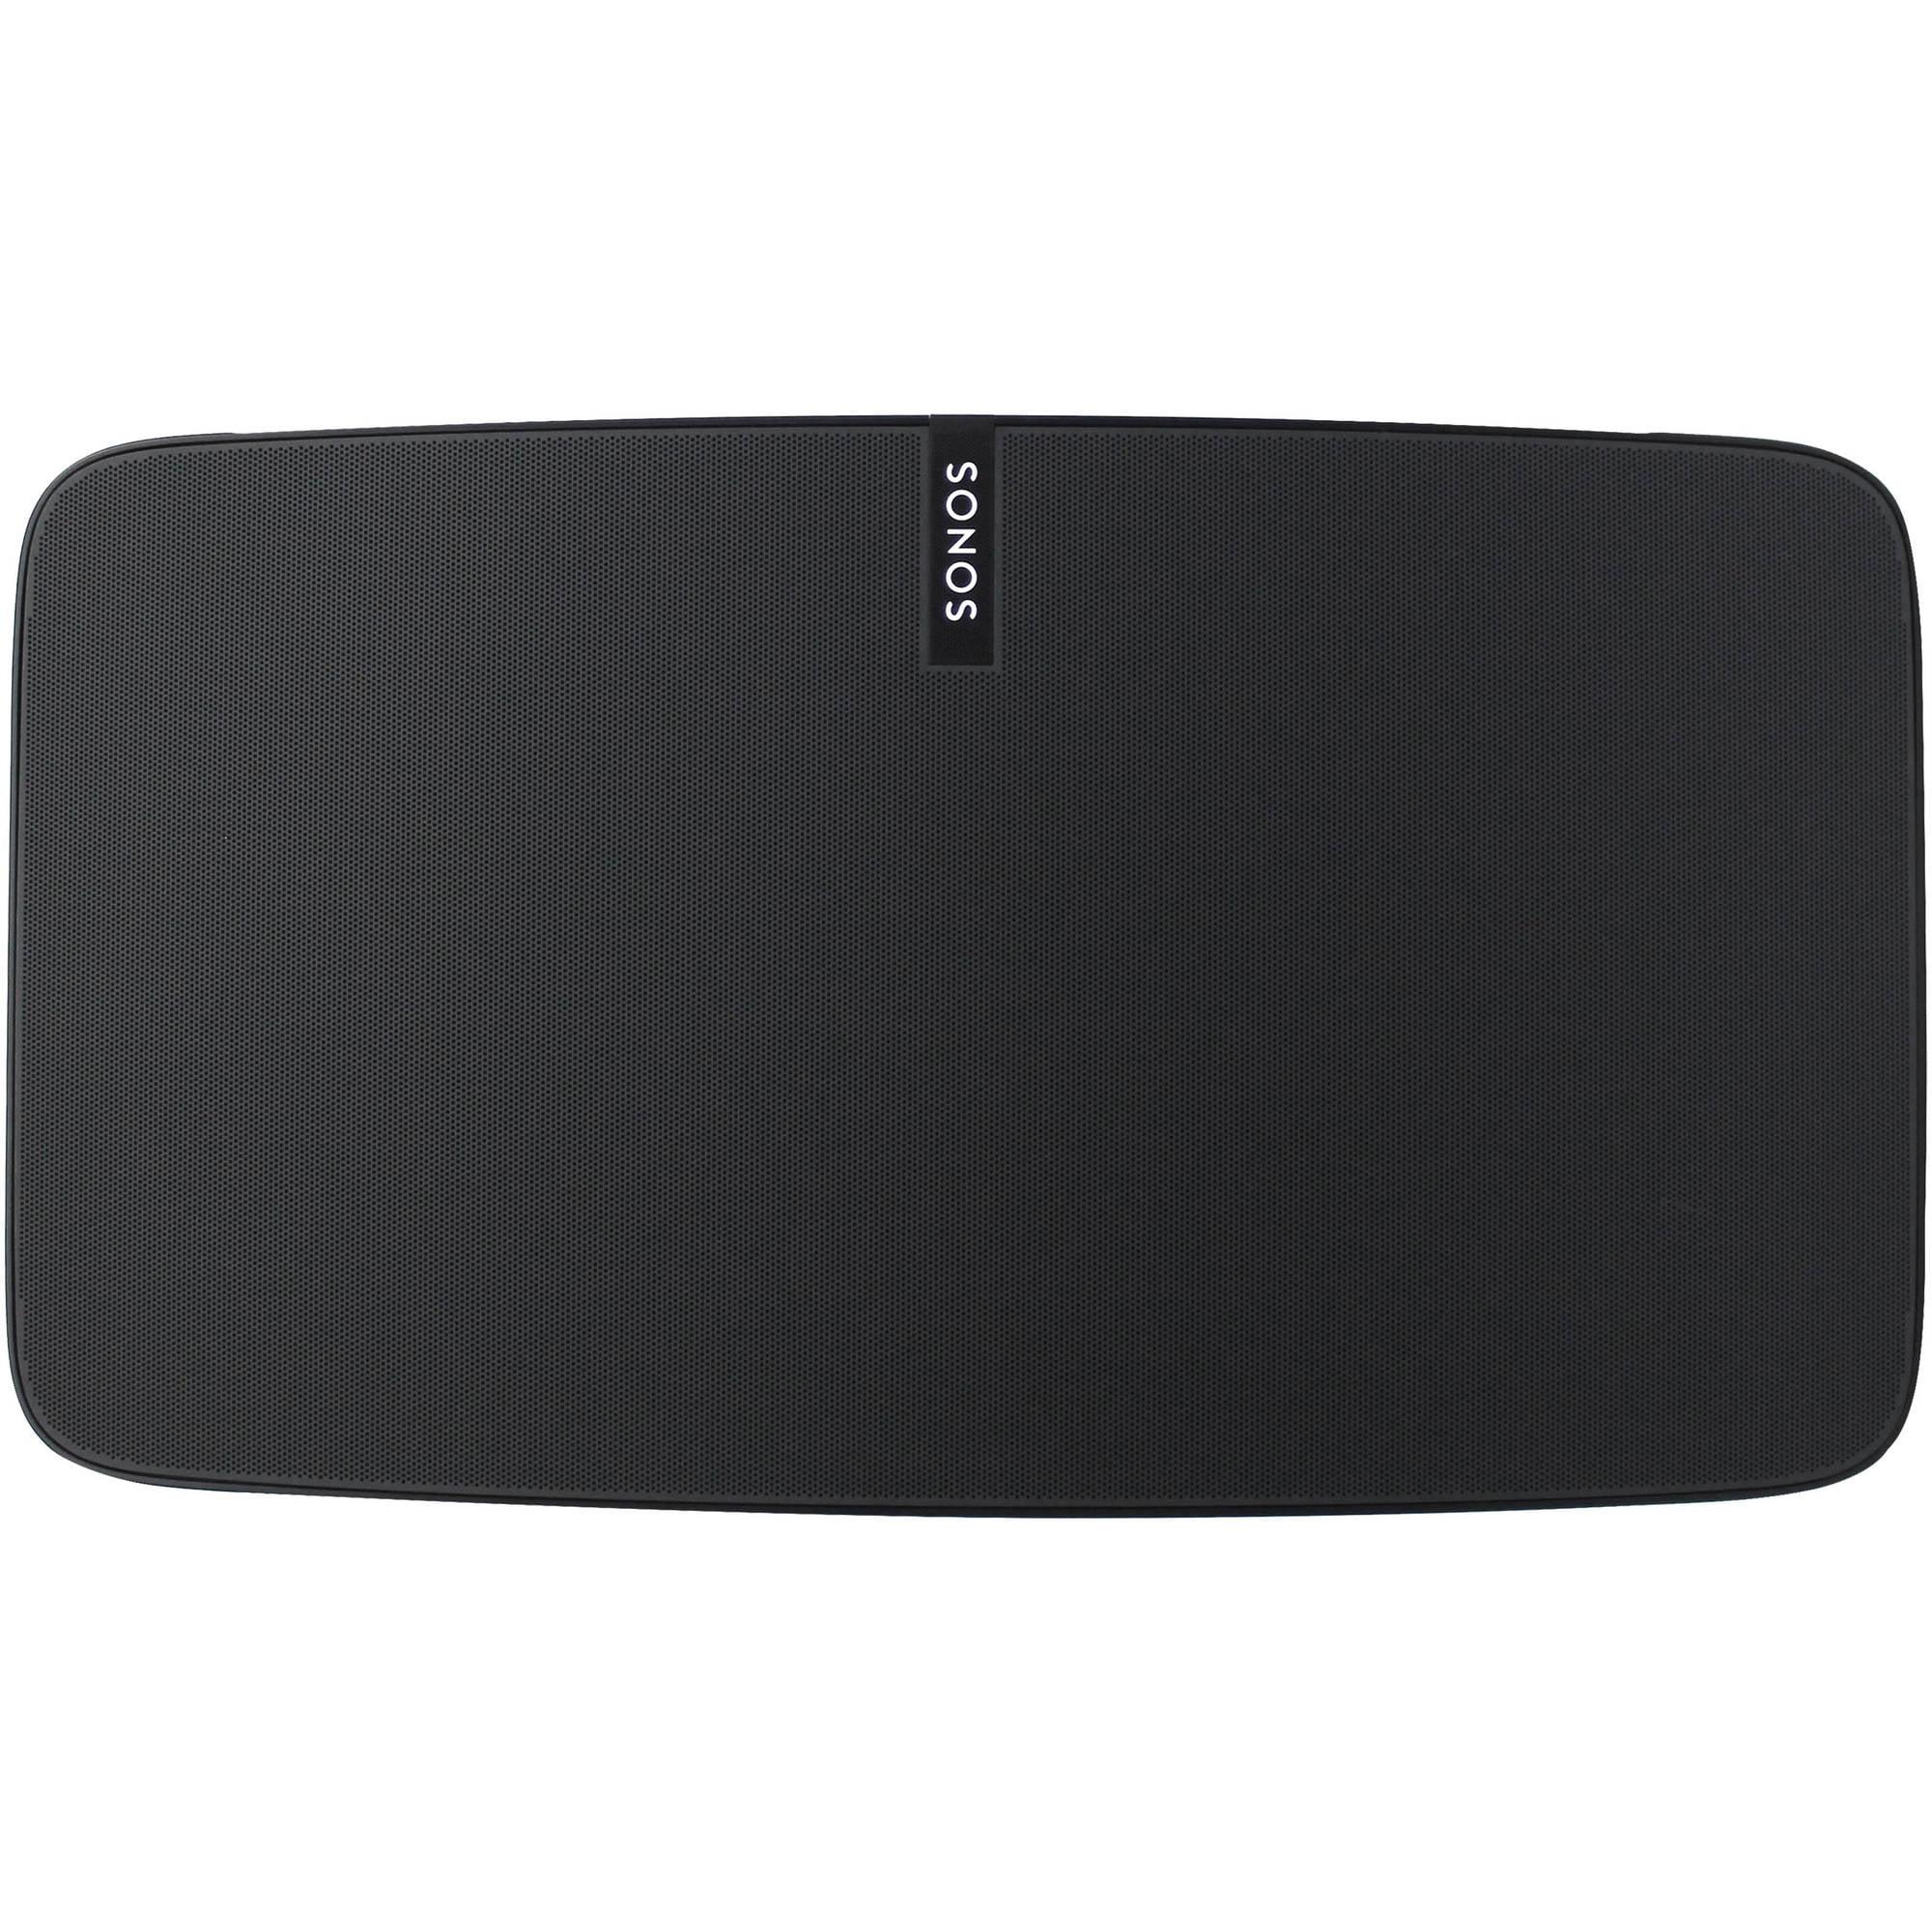 Sonos PLAY:5 Smart Wireless Speaker, Black by Sonos